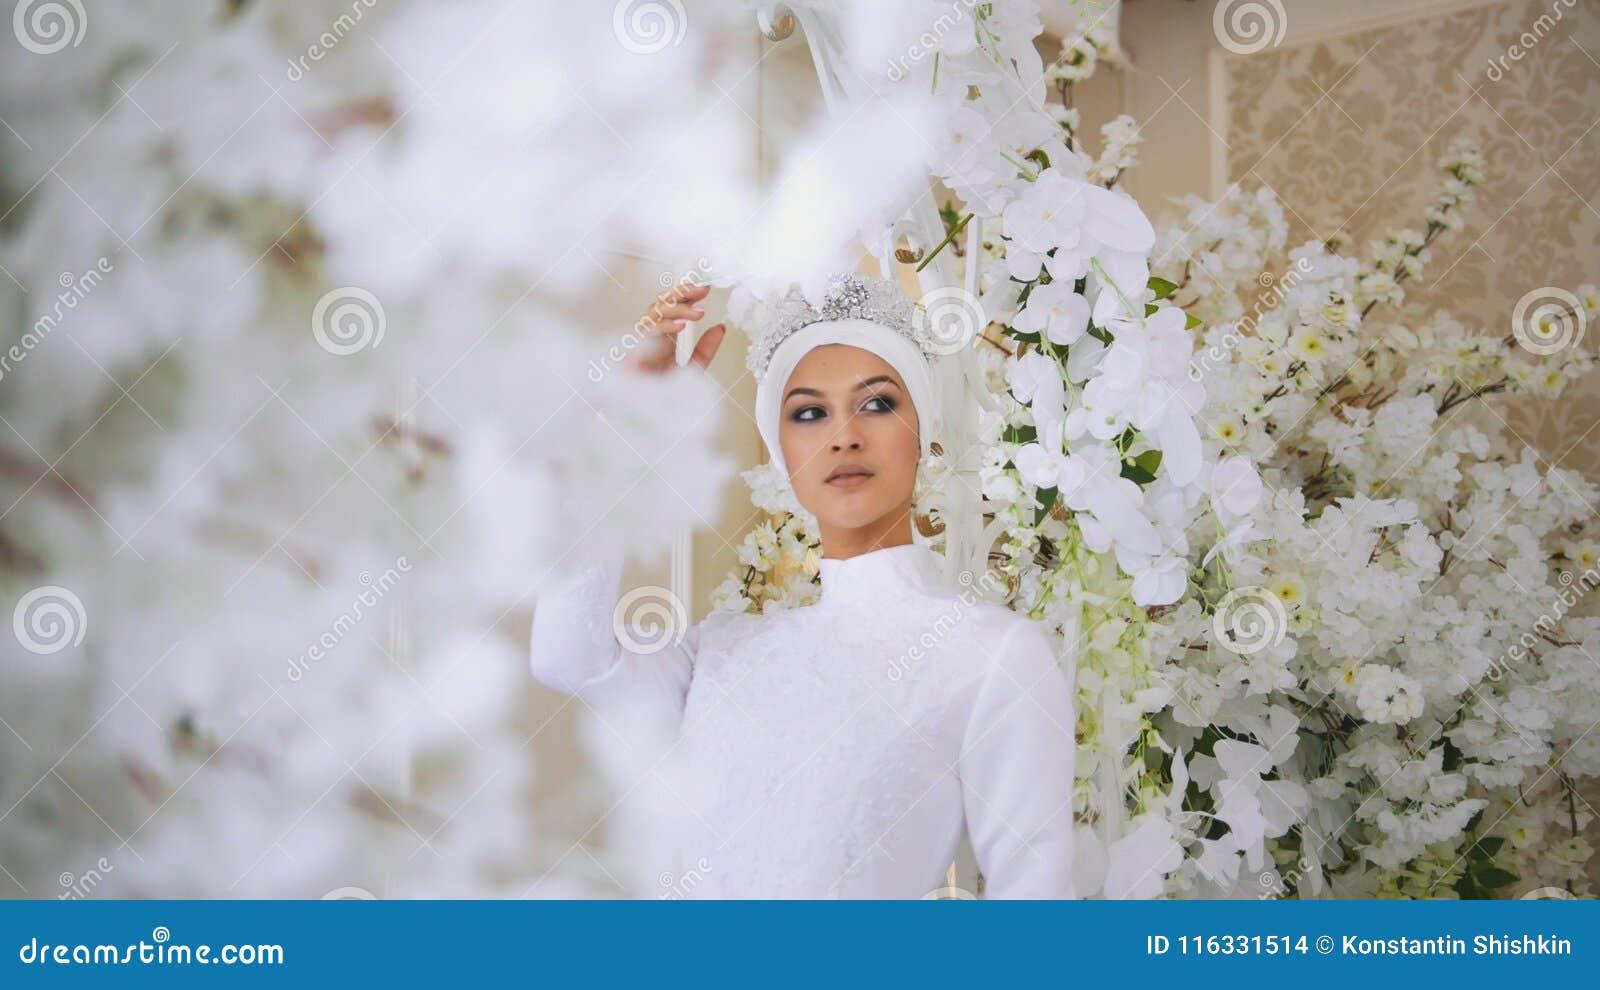 Attractive Muslim Bride With Tiara In Weddind Dress In White Flowers